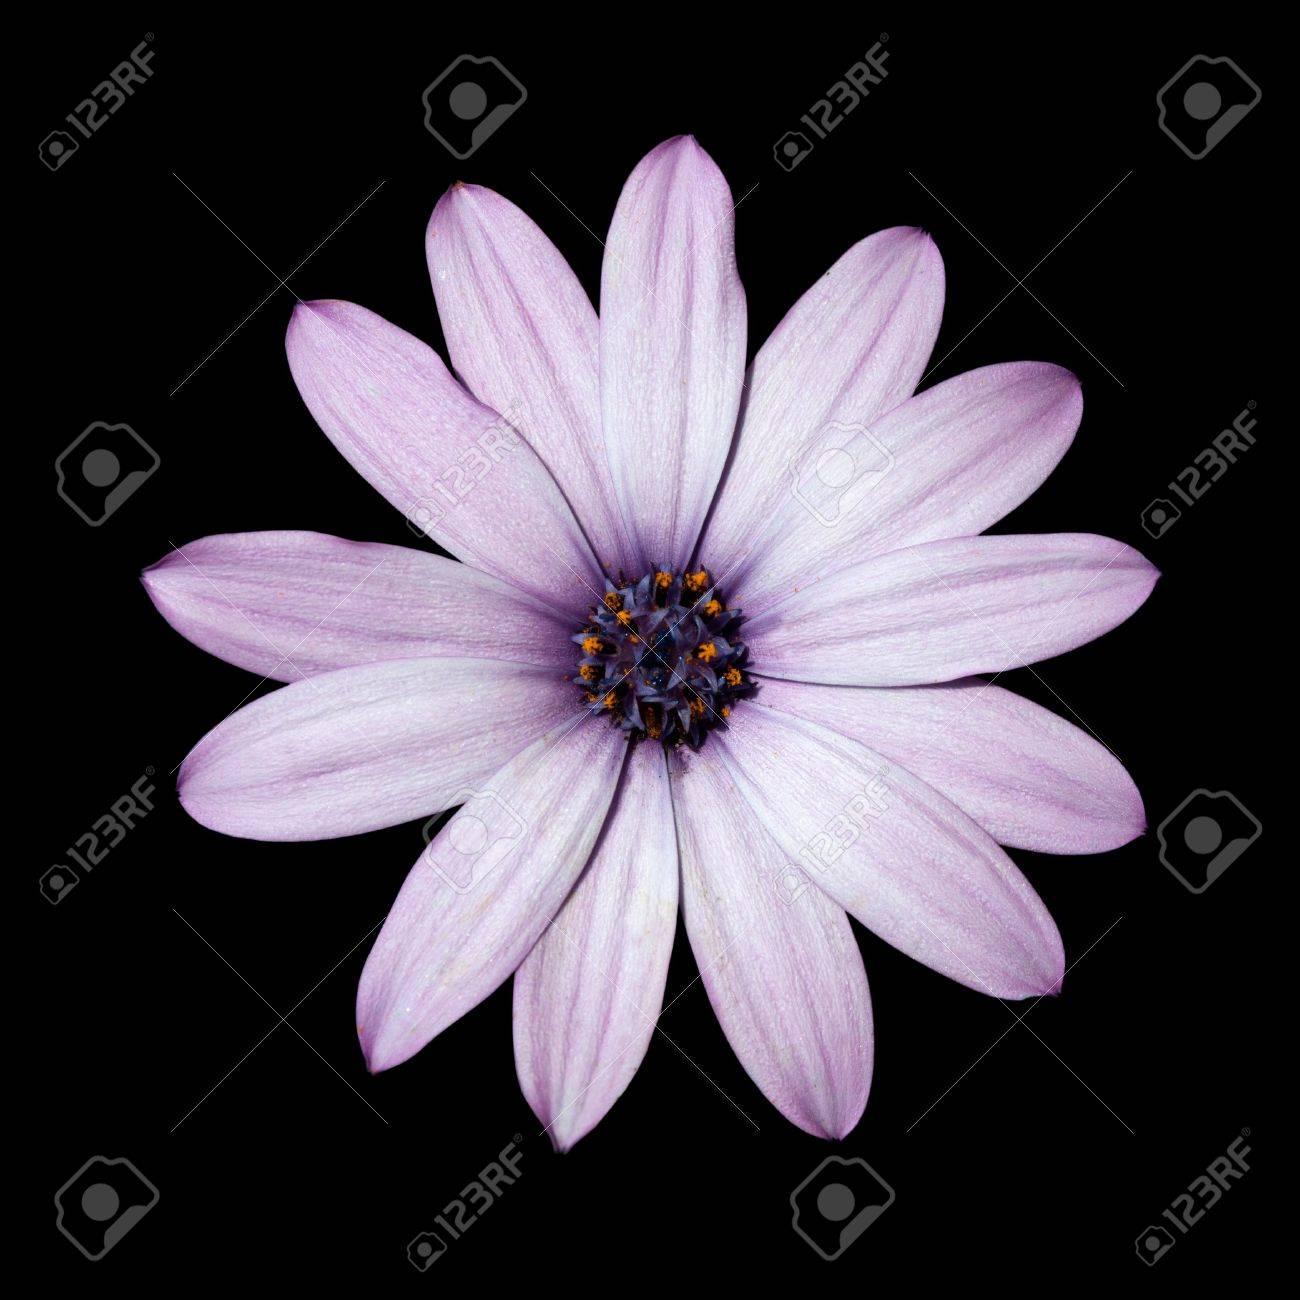 Osteospermum Beautiful Light Purple Daisy Flower Head Top View